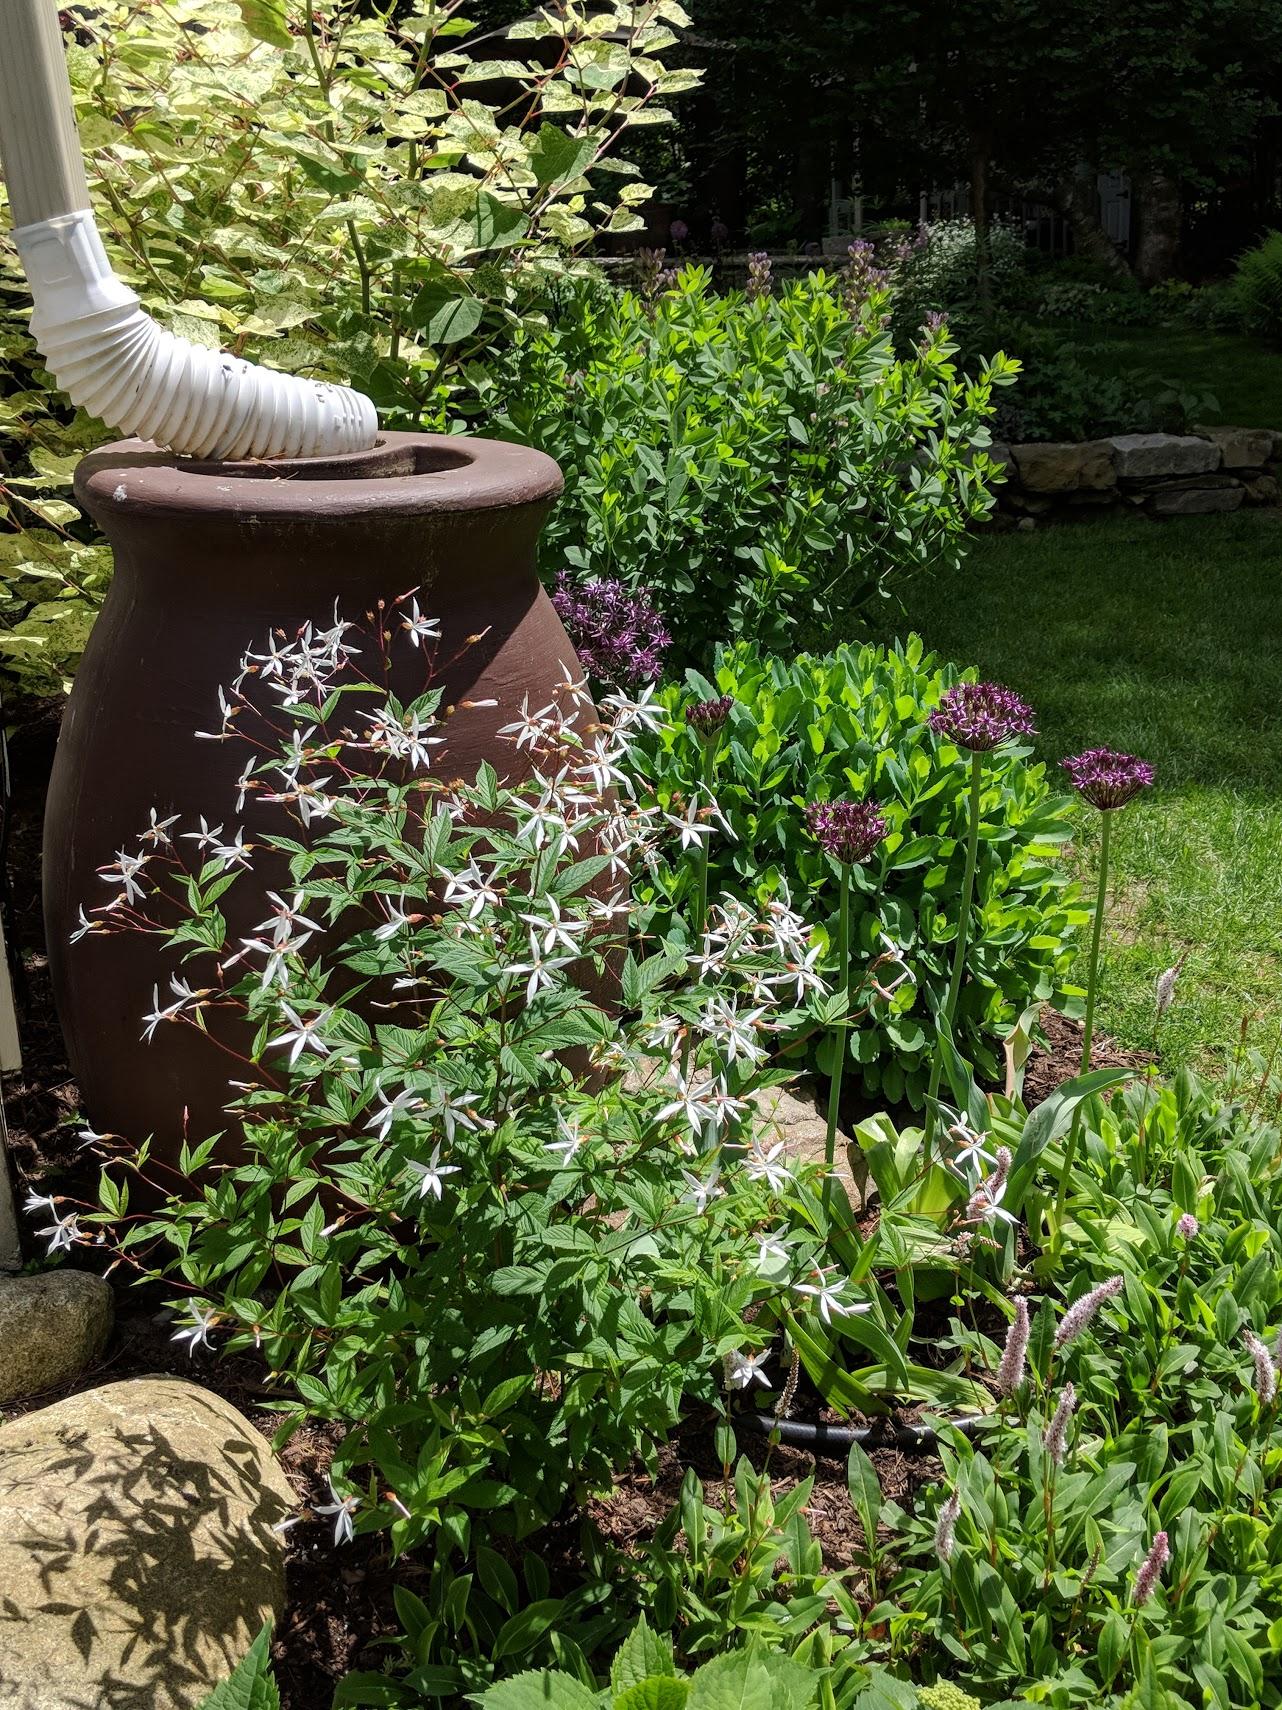 'Miami' allium, gillenia trifoliata and persicaria 'superba' help to soften the rain barrel.